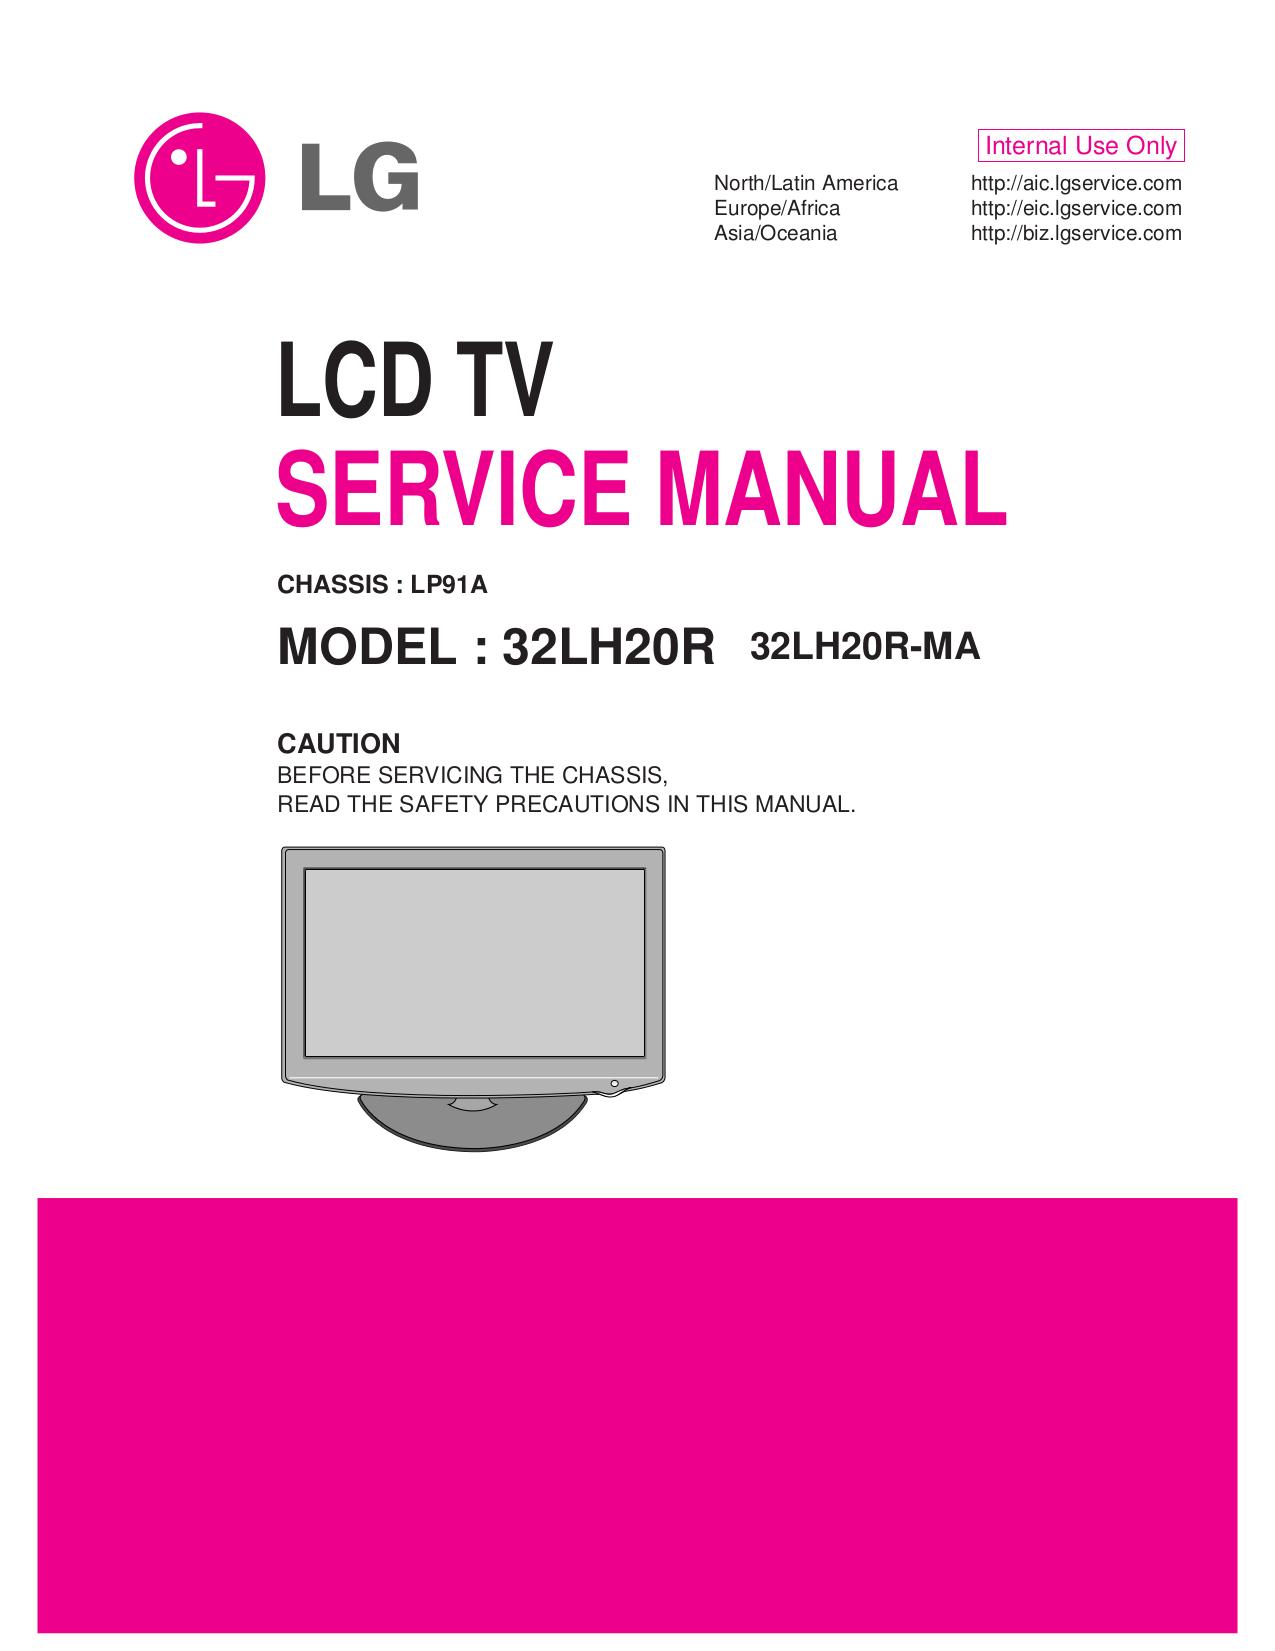 pdf for LG TV 32LH20R manual